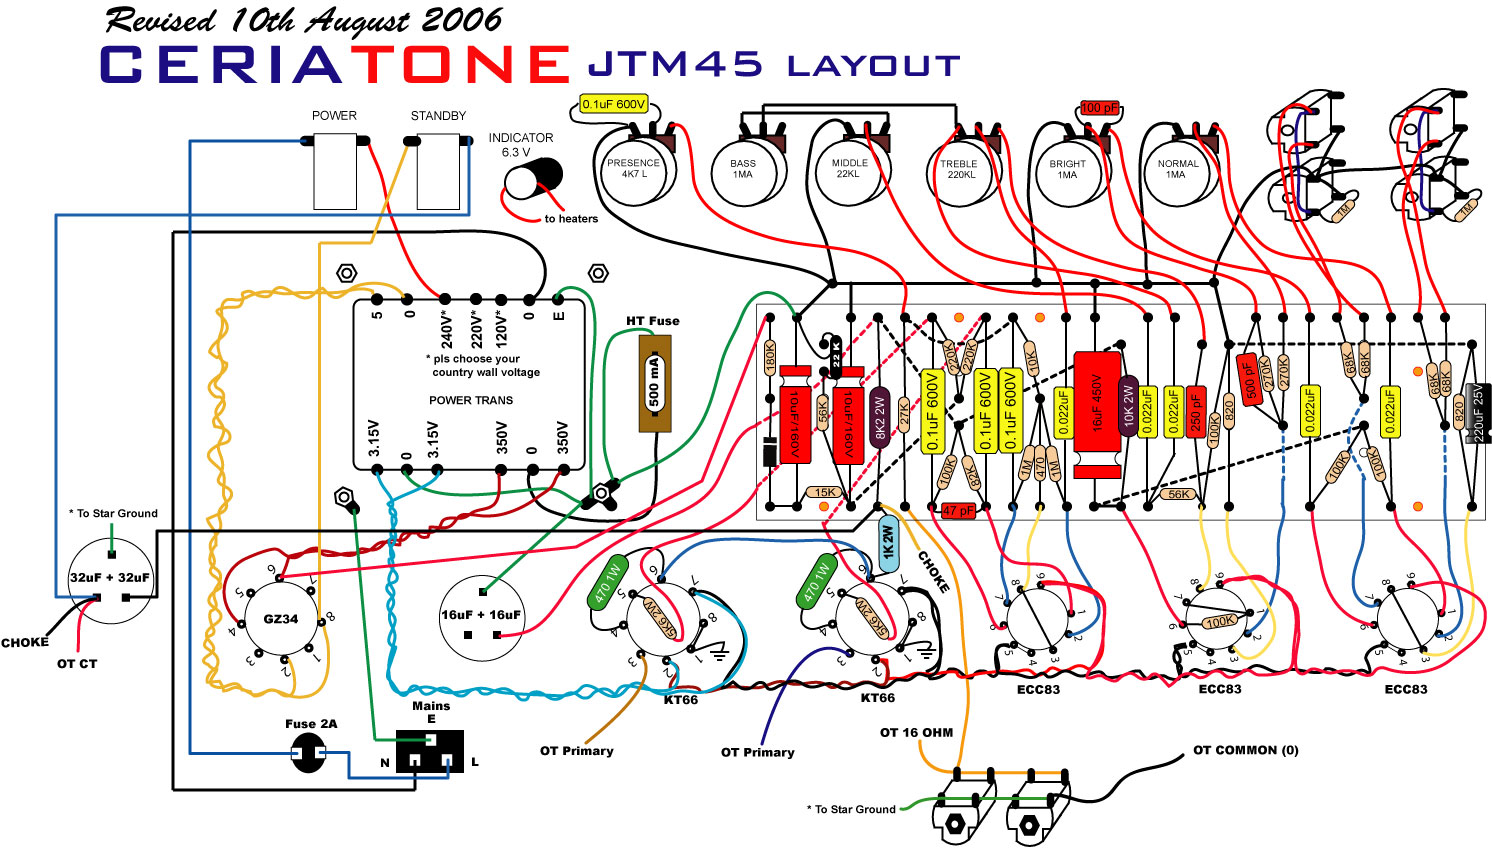 Audio  lifier Schematic also Mos Fet Audio Lifier moreover 3 Transistor Fuzz Schematic together with 100 Watt Tube   Schematic in addition Diy Tube Guitar   Schematics. on tube audio power lifier circuit